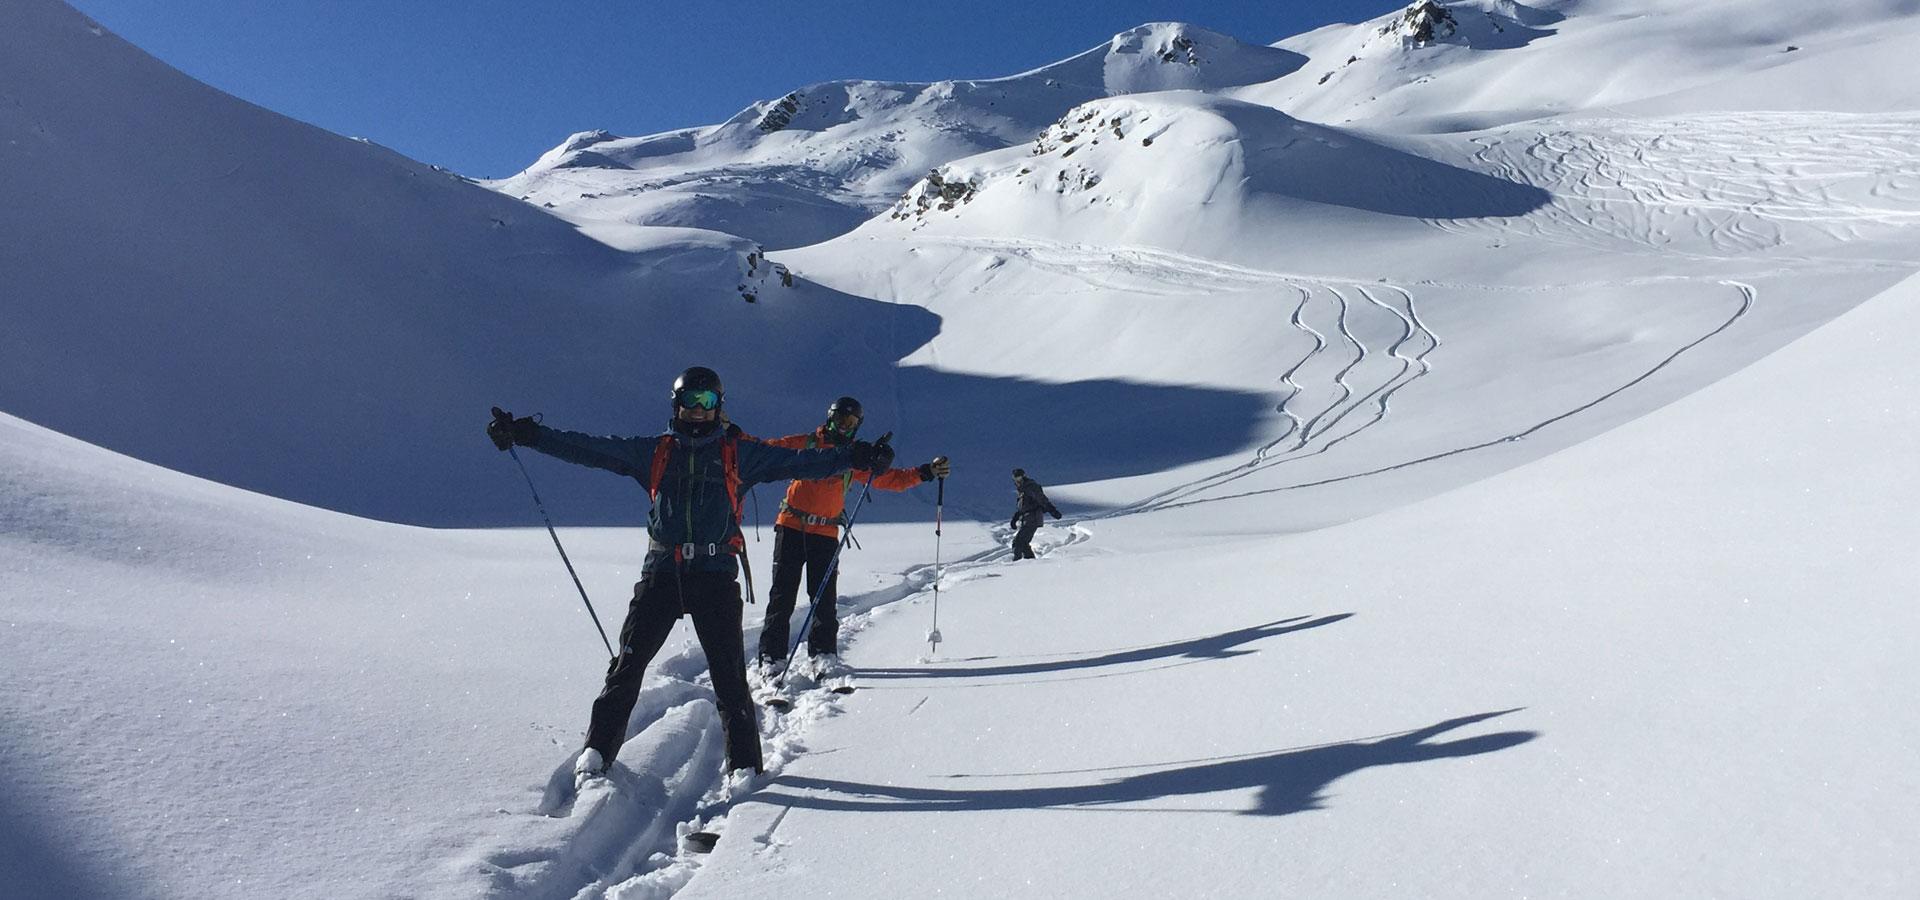 Ski Hors Piste La Clusaz